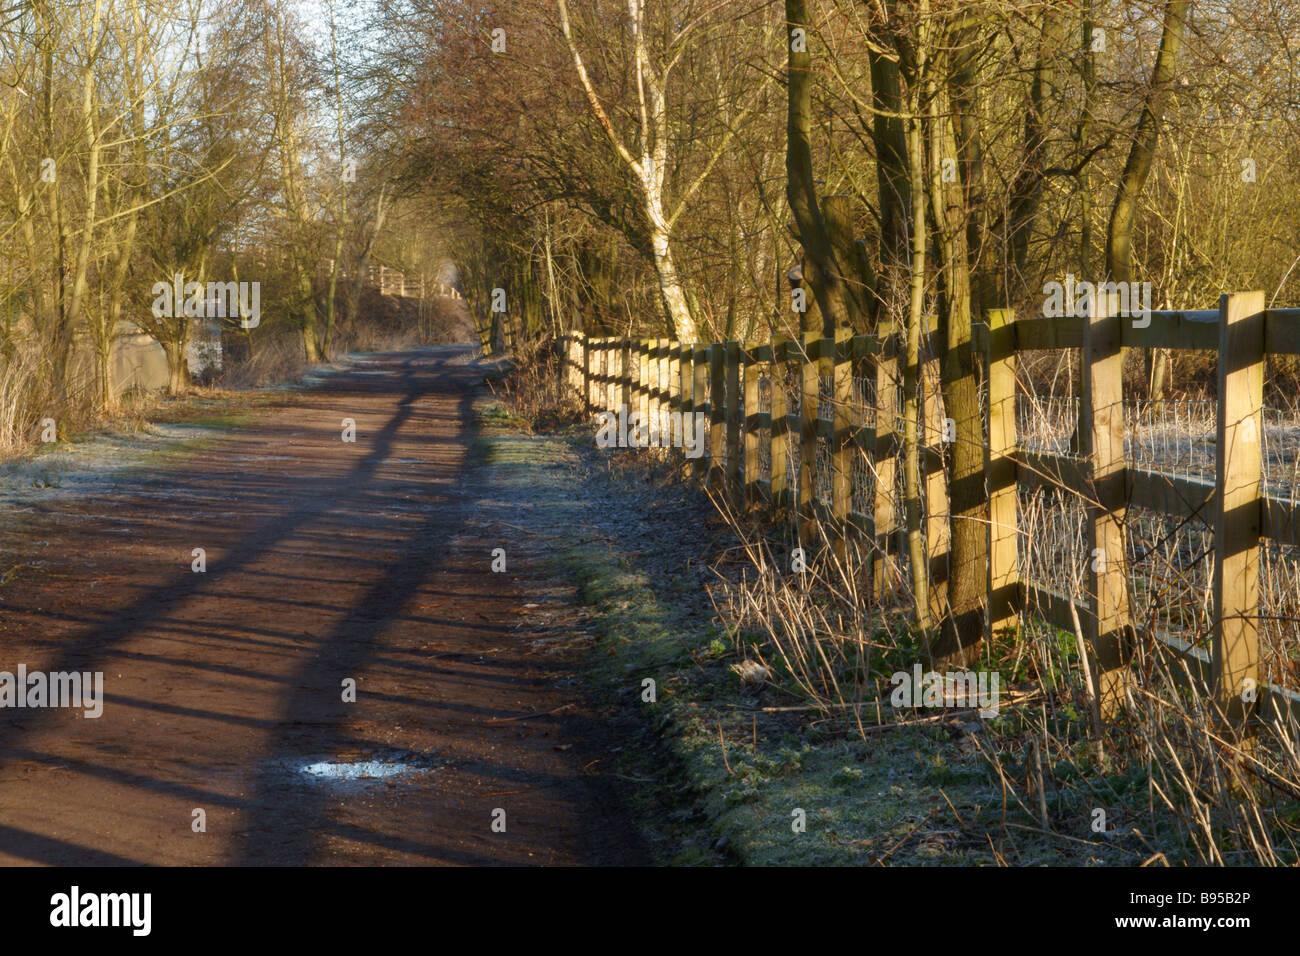 River Lea Towpath - Stock Image